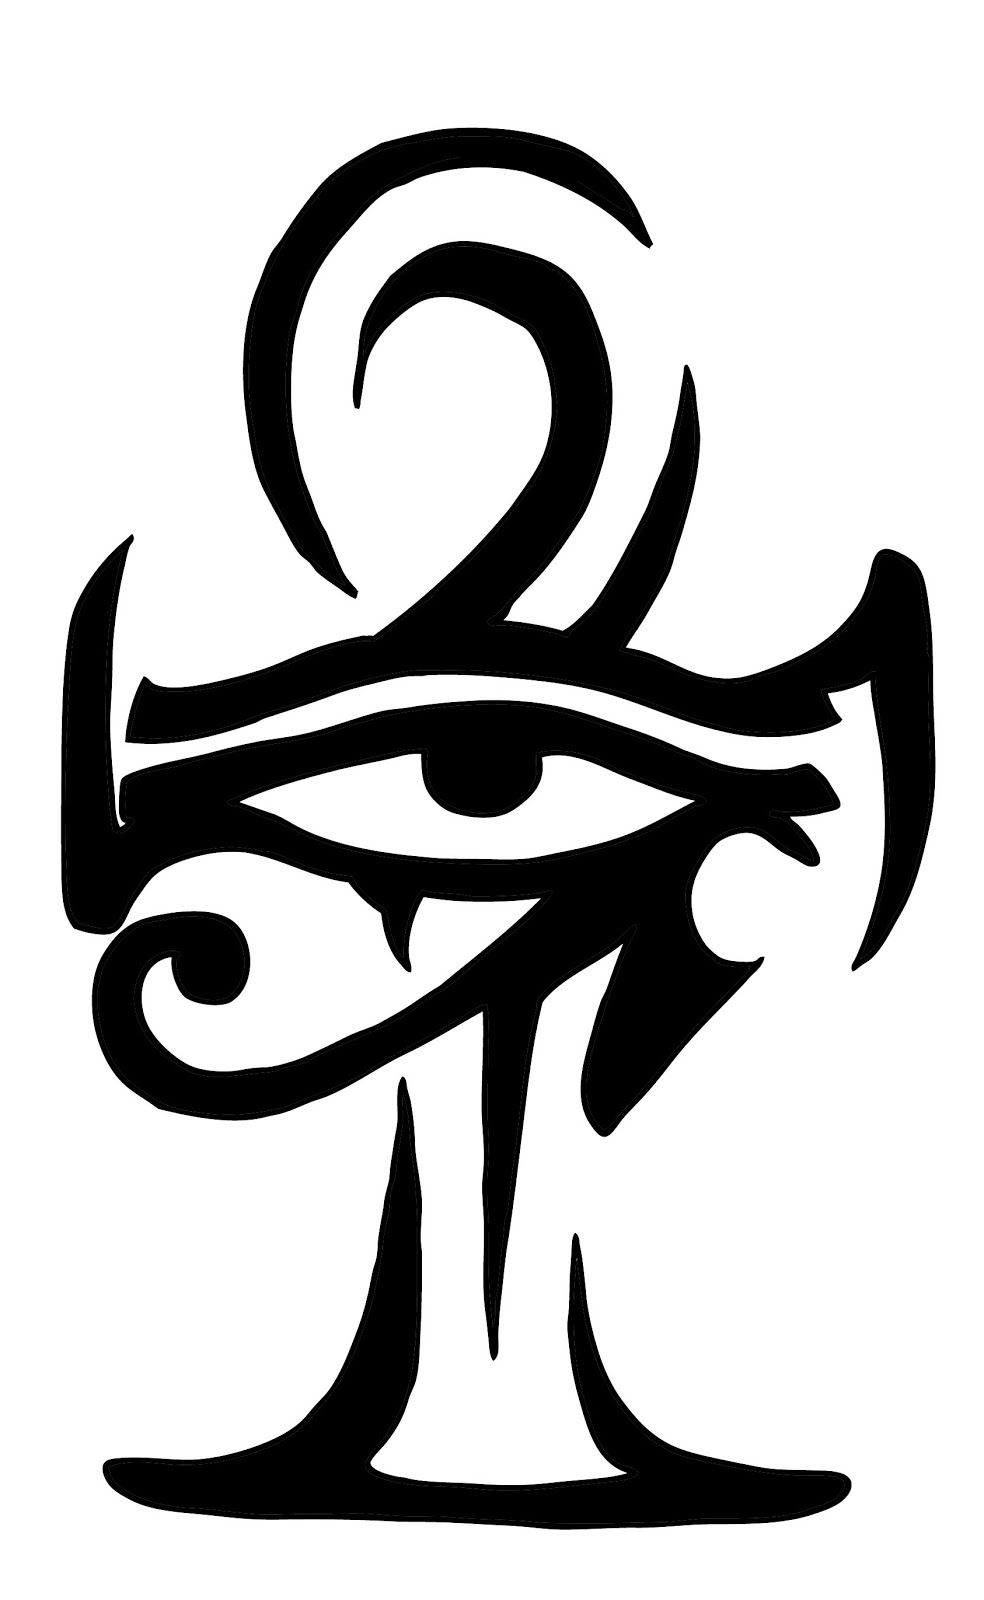 69d041379 Egyptian Eye & Ankh | Tattoos | Ankh tattoo, Horus tattoo, Egyptian ...